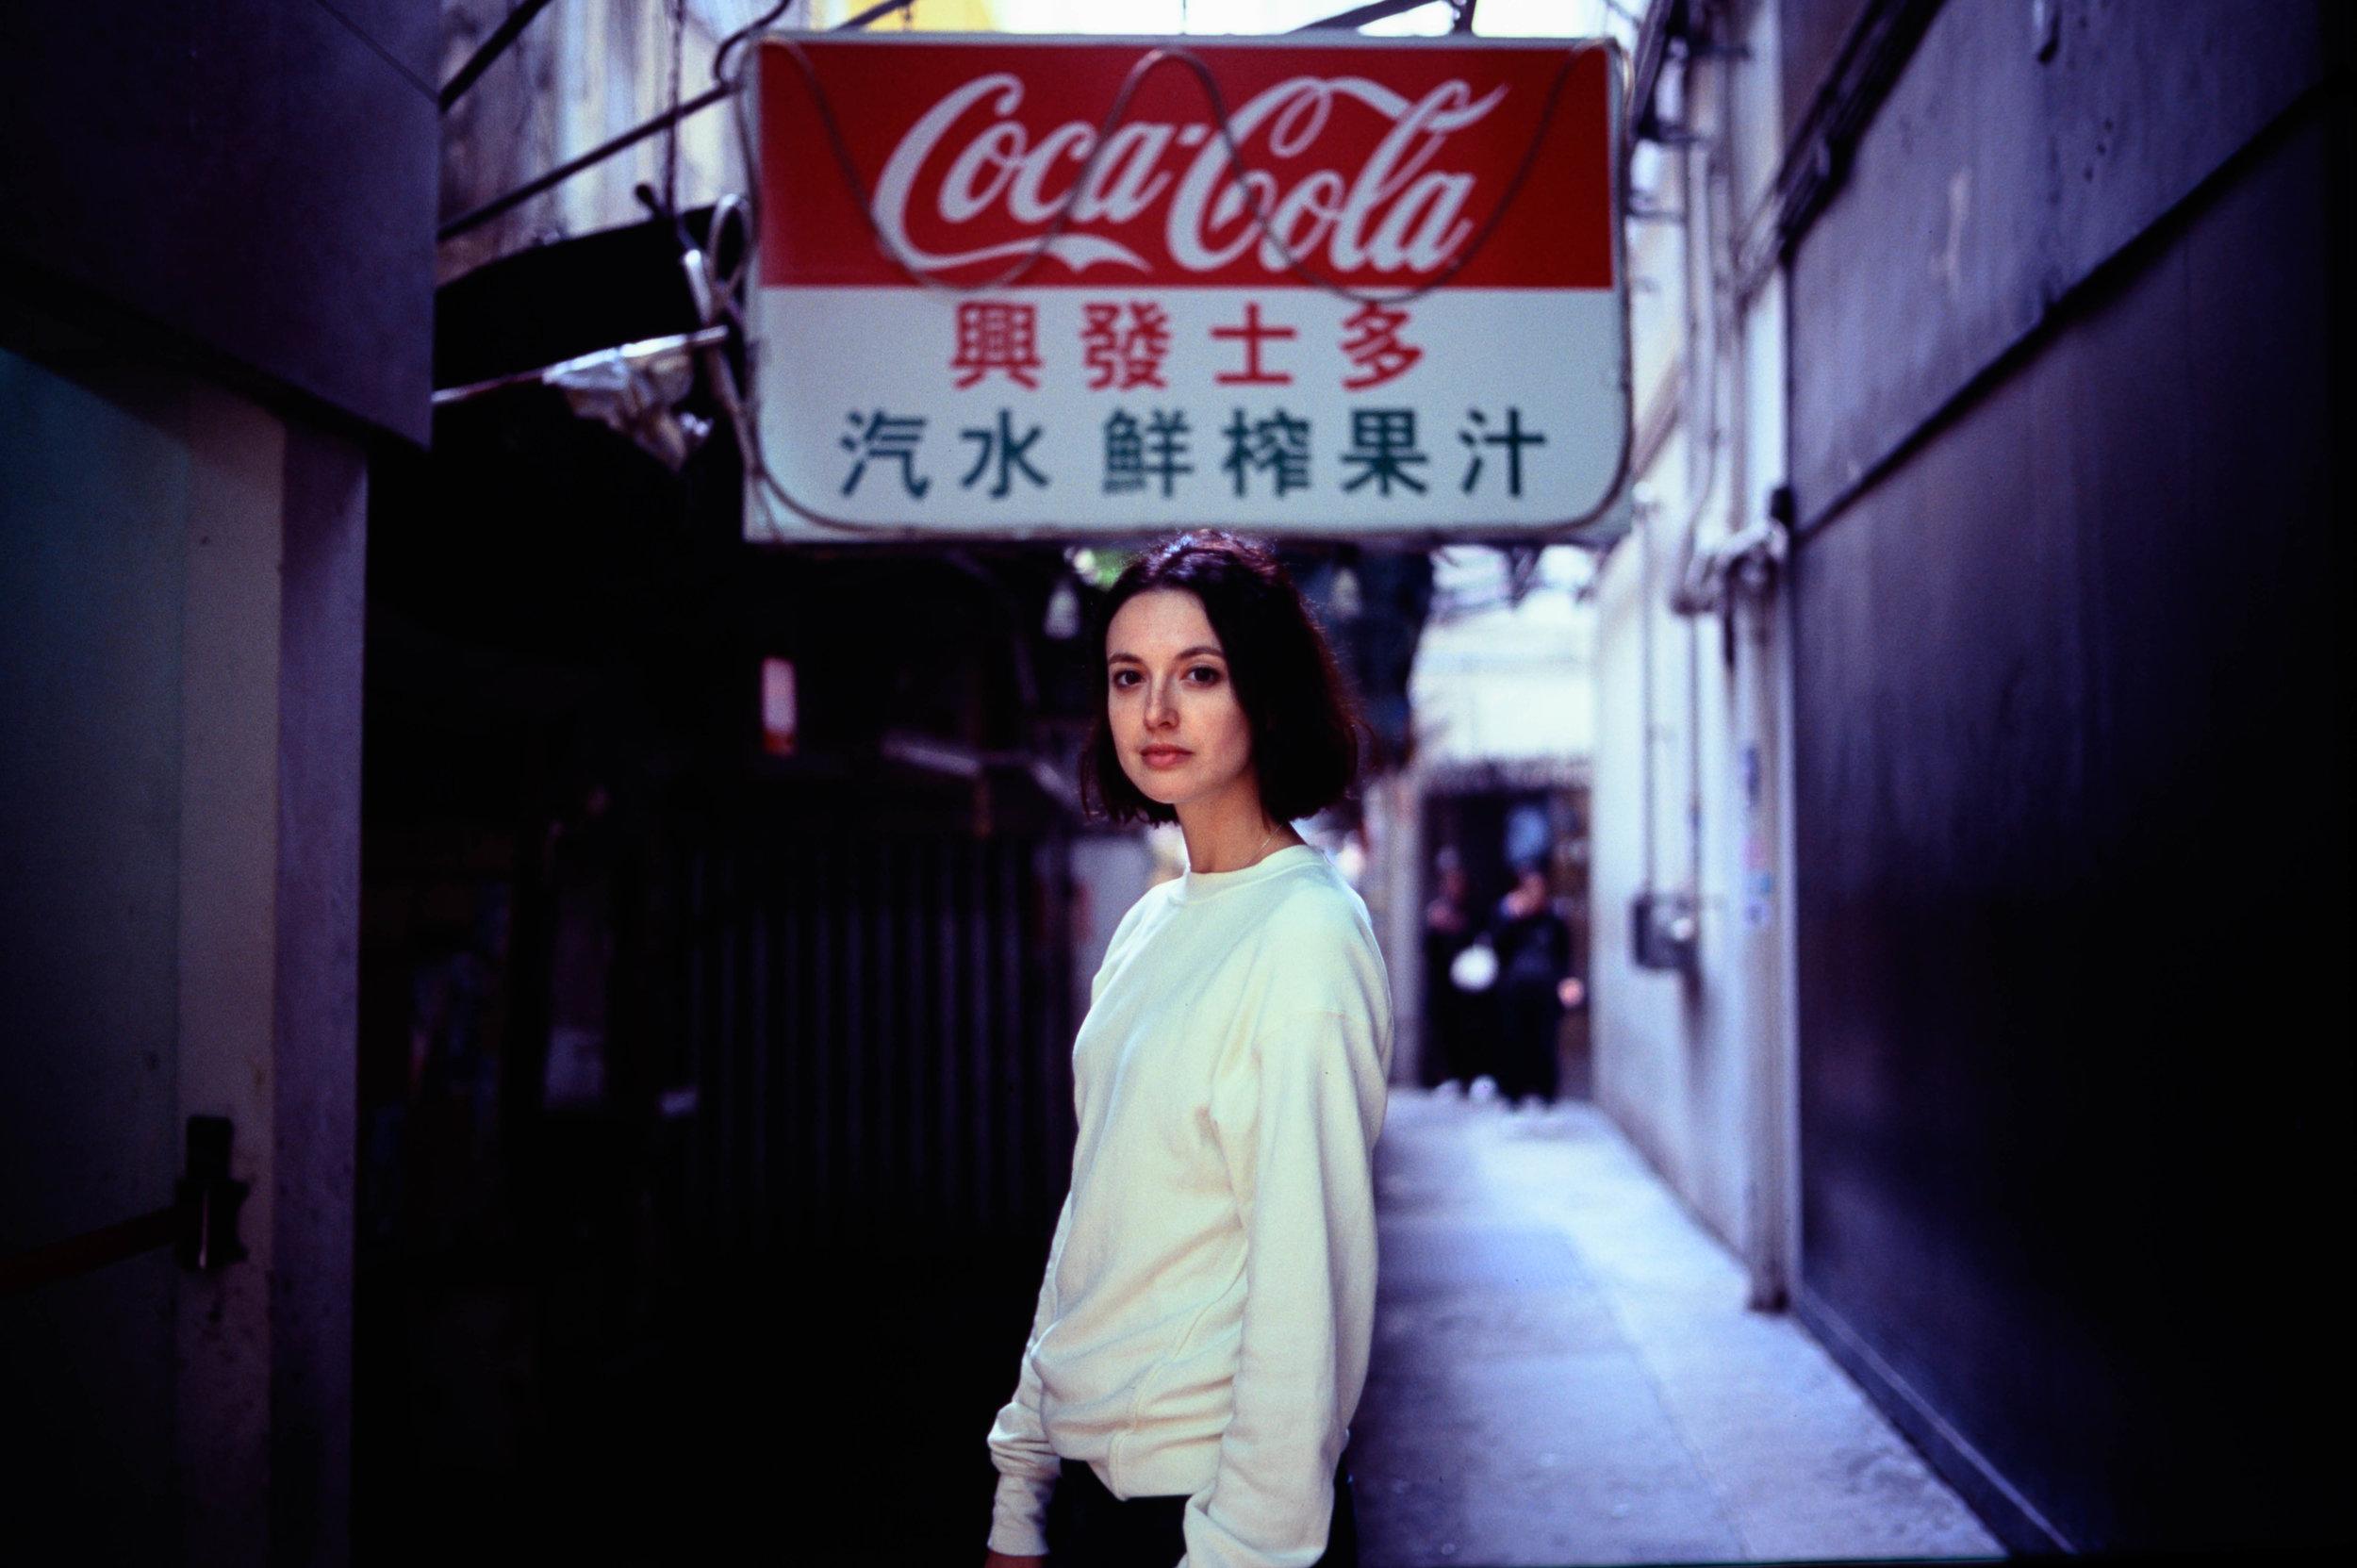 Leica MP-6 + Leica 35mm f/1.4 Summilux-M Aspherical + Fuji Velvia 100